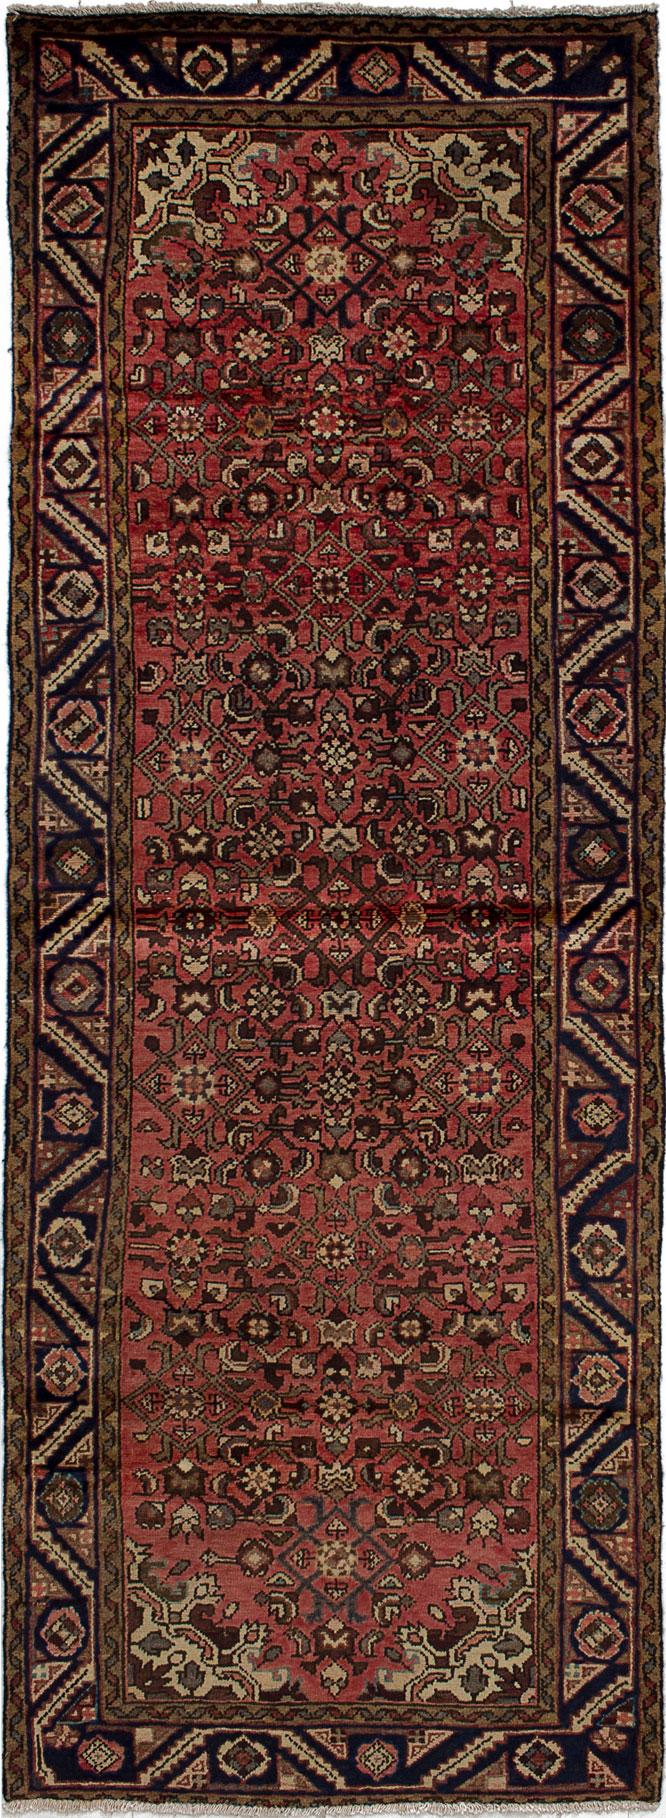 "Hand-knotted Hamadan Dark Copper Wool Rug 3'2"" x 9'1"" Size: 3'2"" x 9'1"""